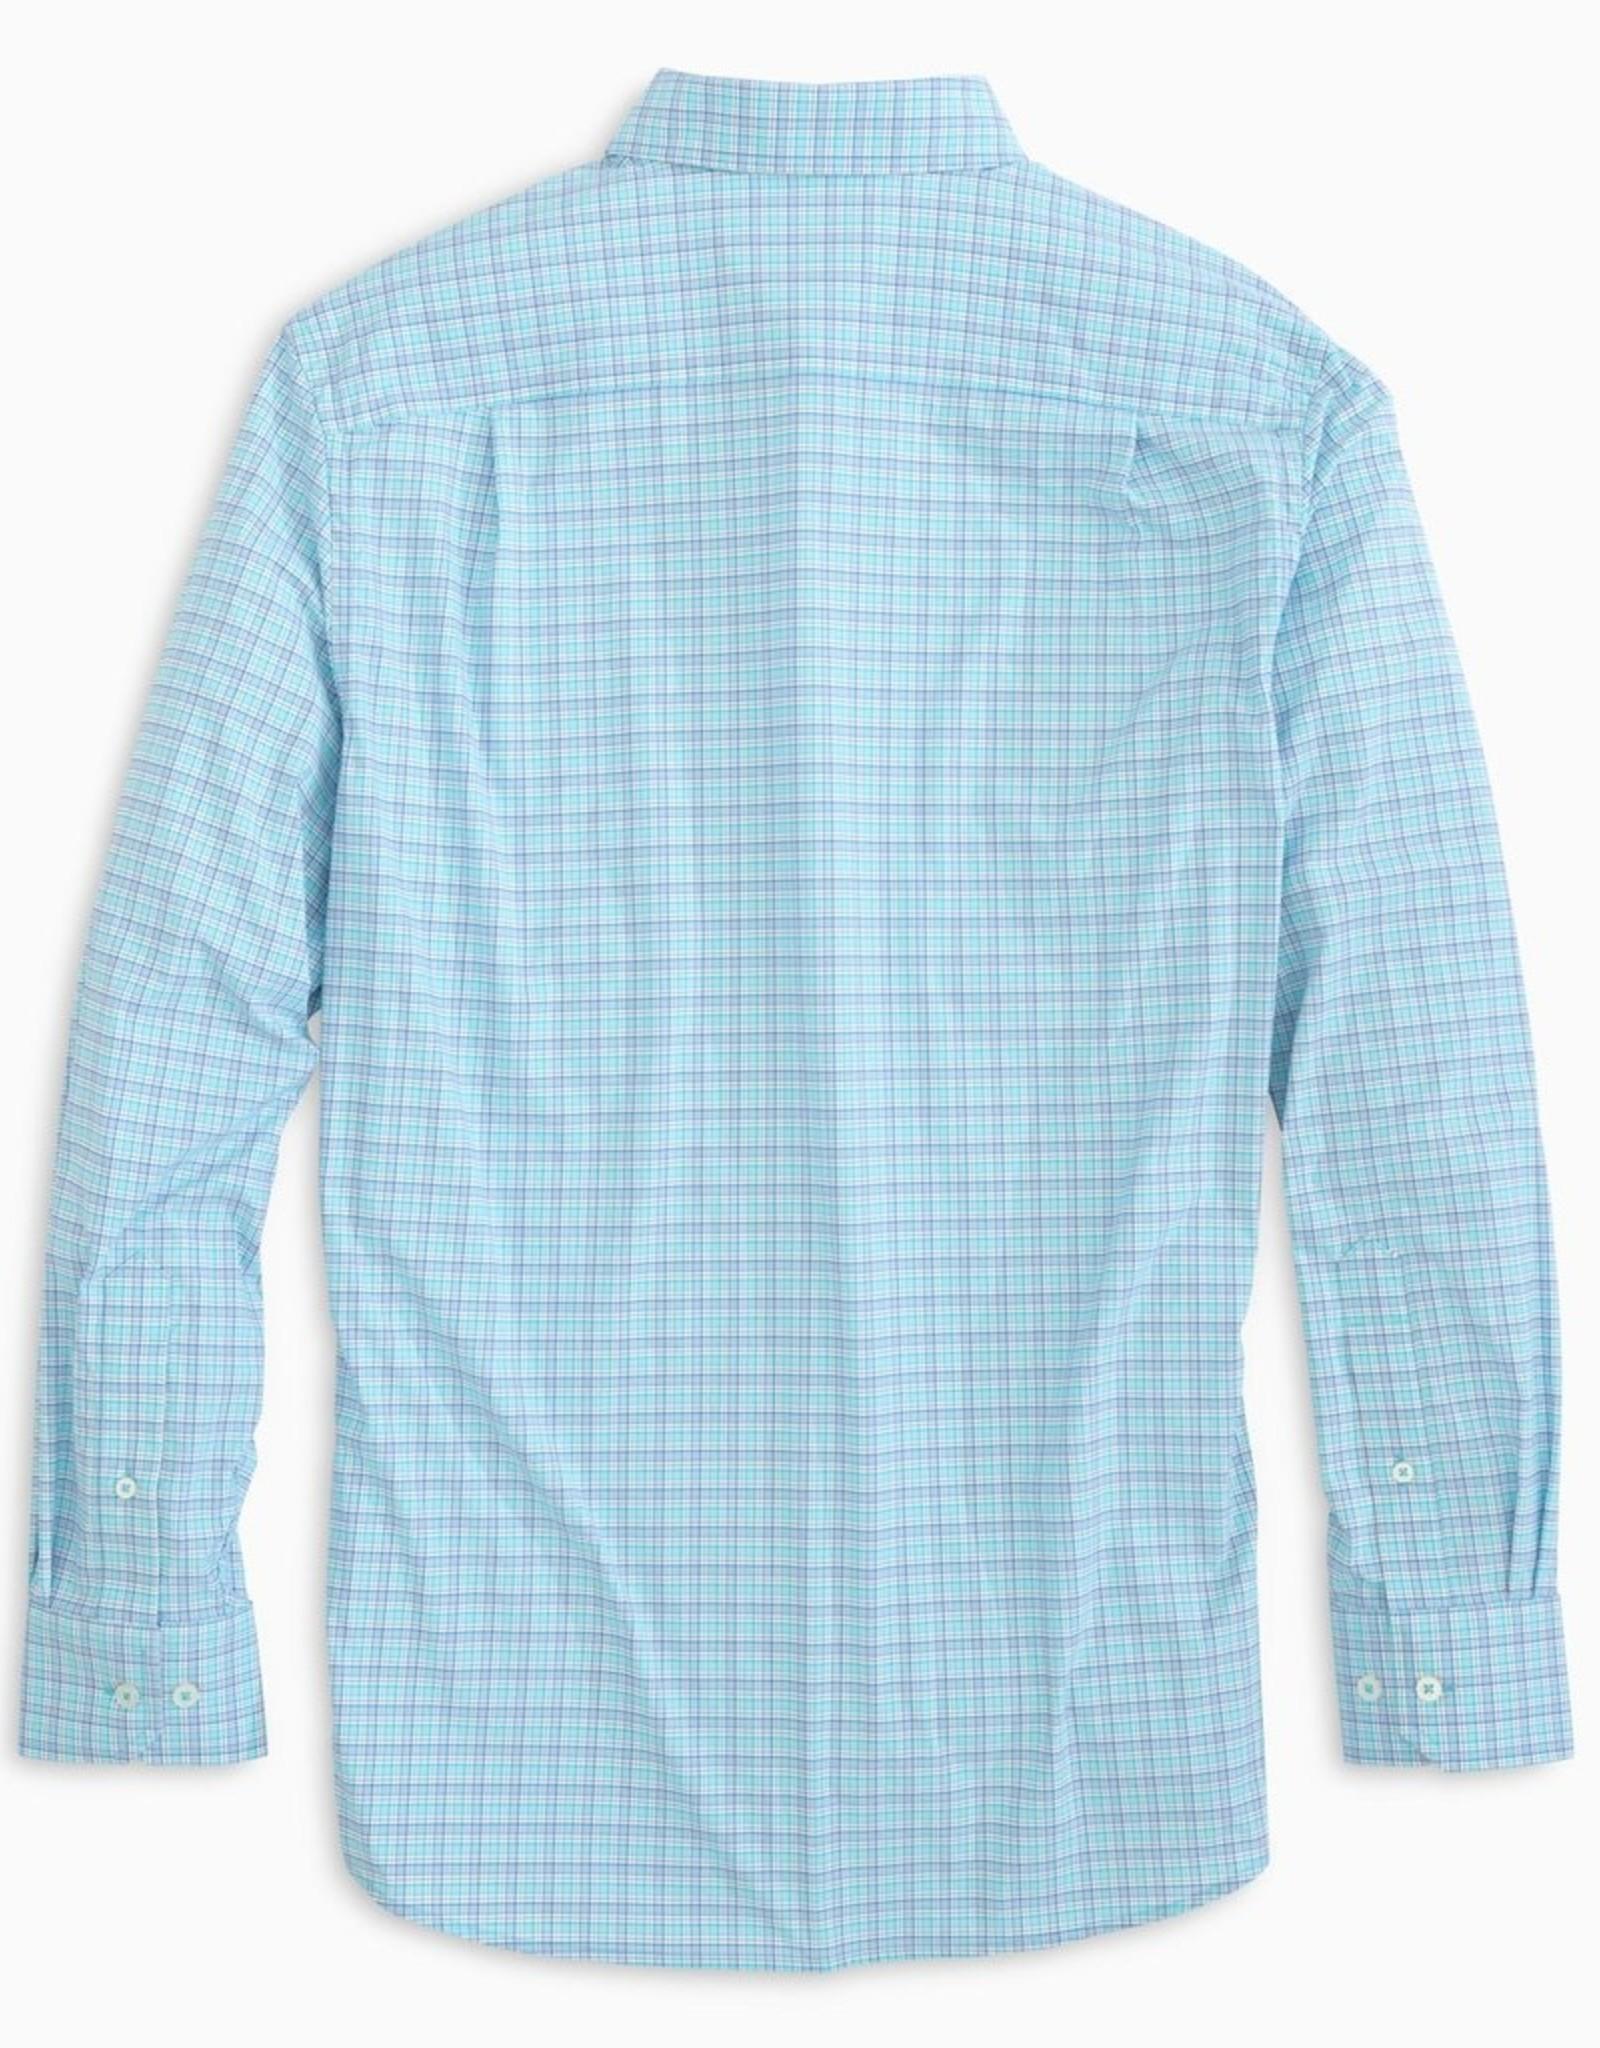 Southern Tide Intercoastal Basin Mini Check Sportshirt